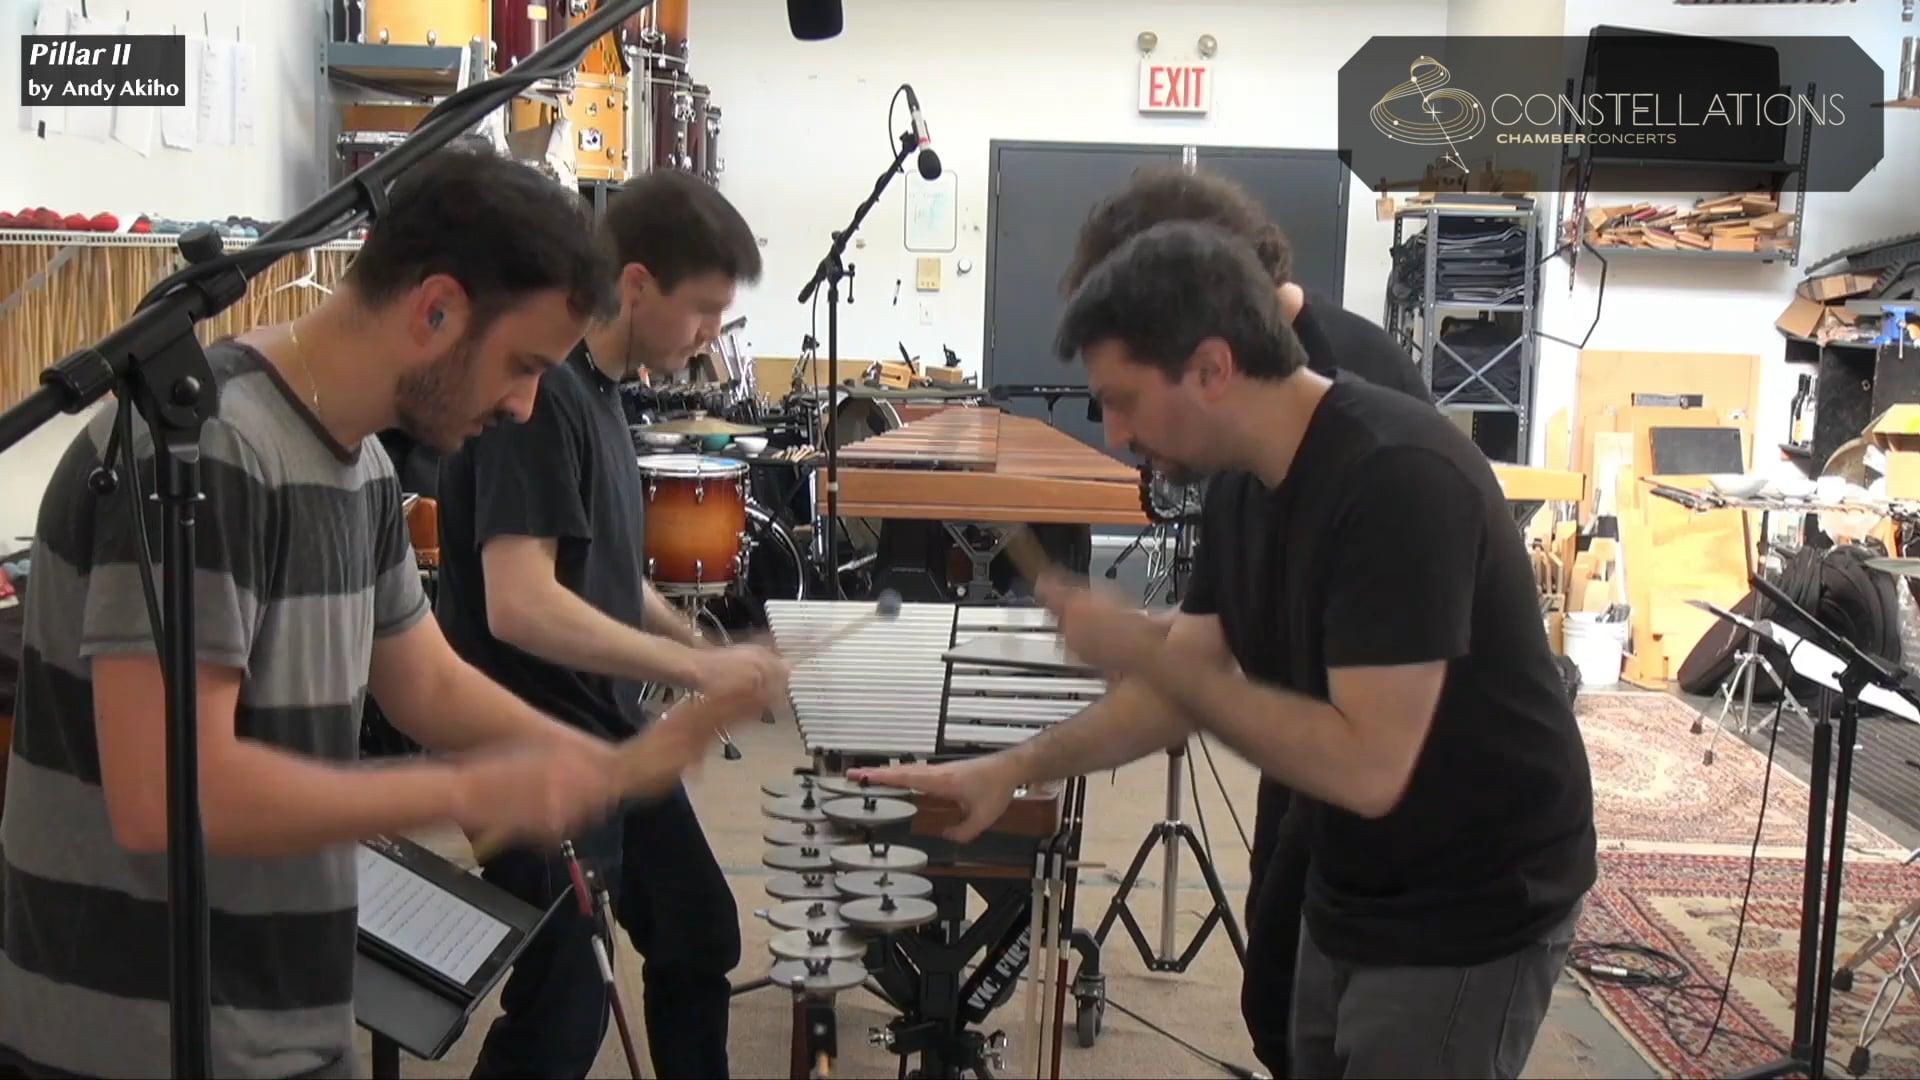 Sandbox Percussion: Pillar II by Andy Akiho